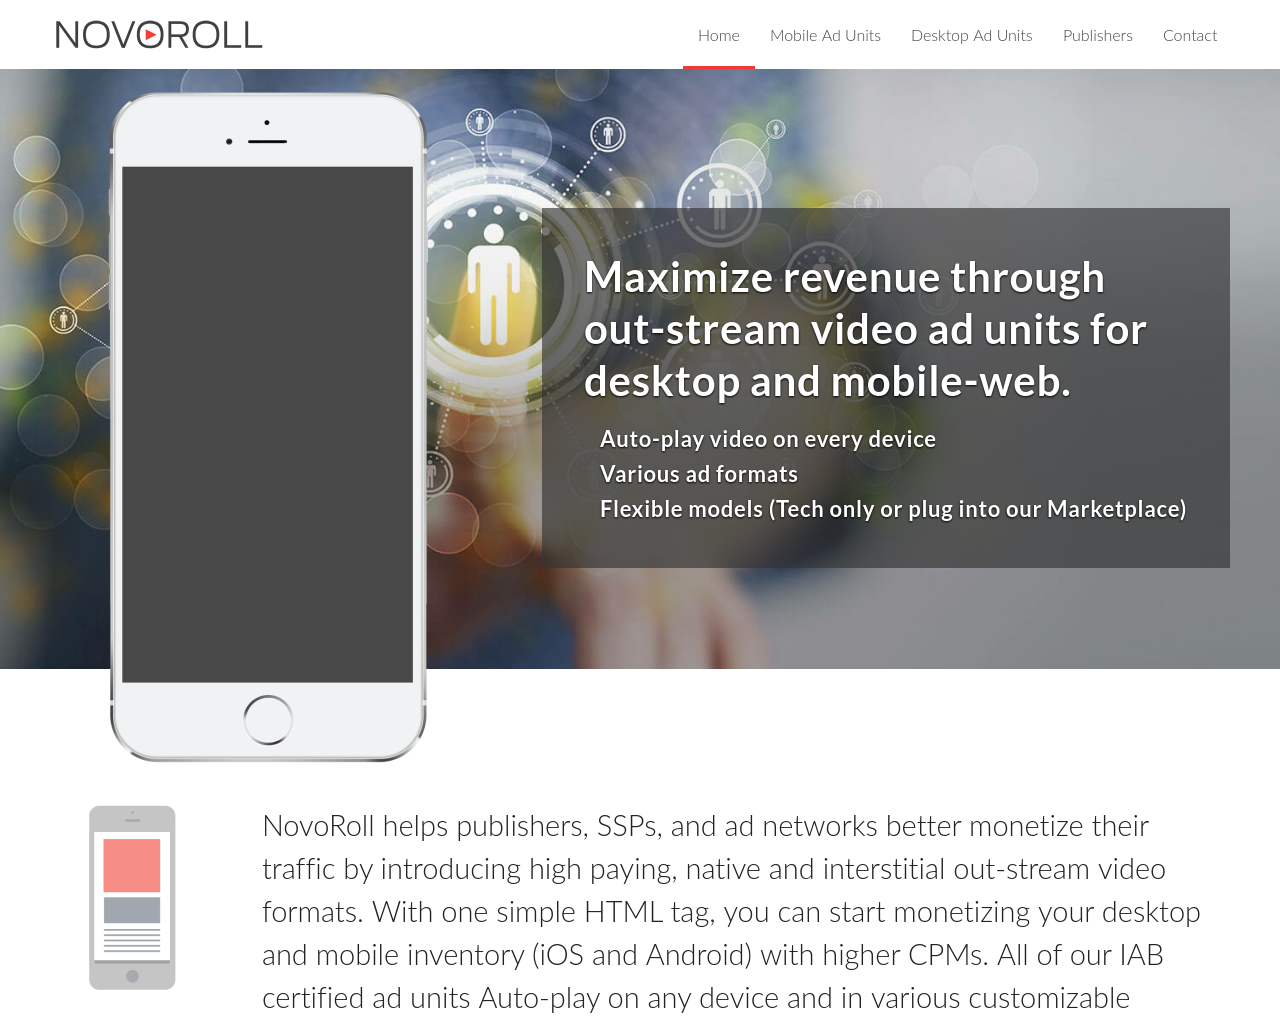 NovoRoll-Advertising-Reviews-Pricing